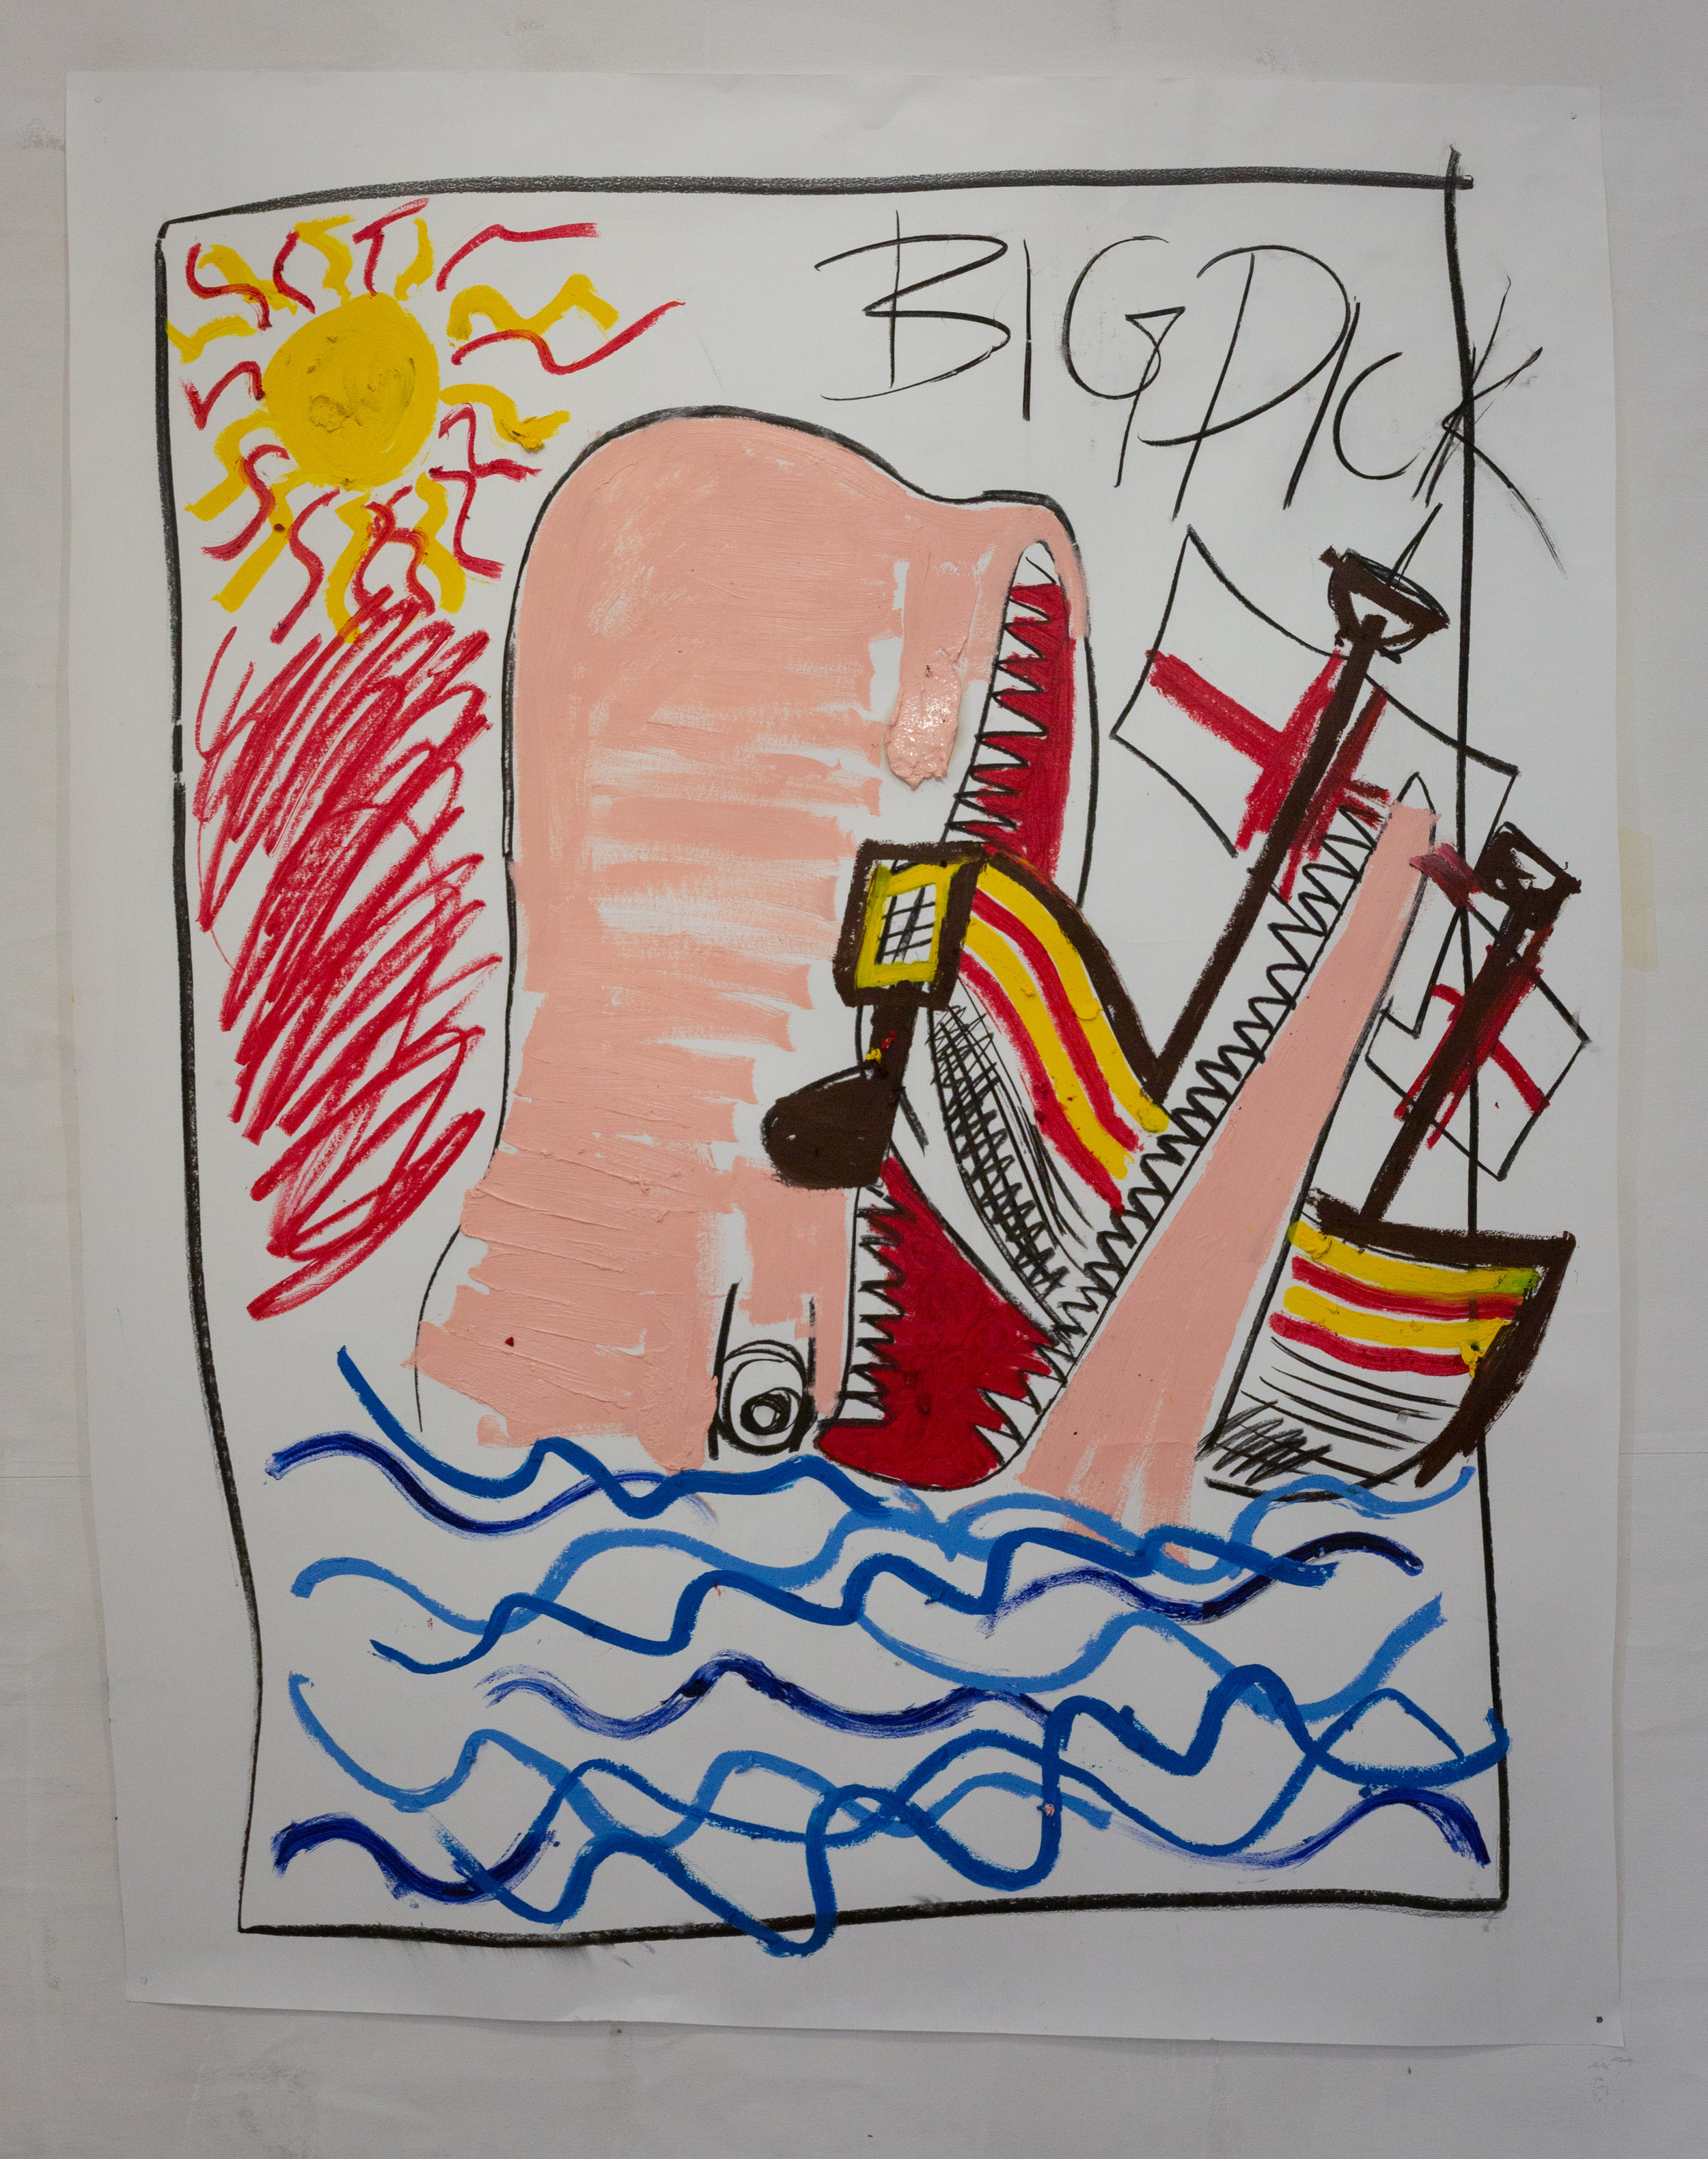 Big Dick (32).jpg